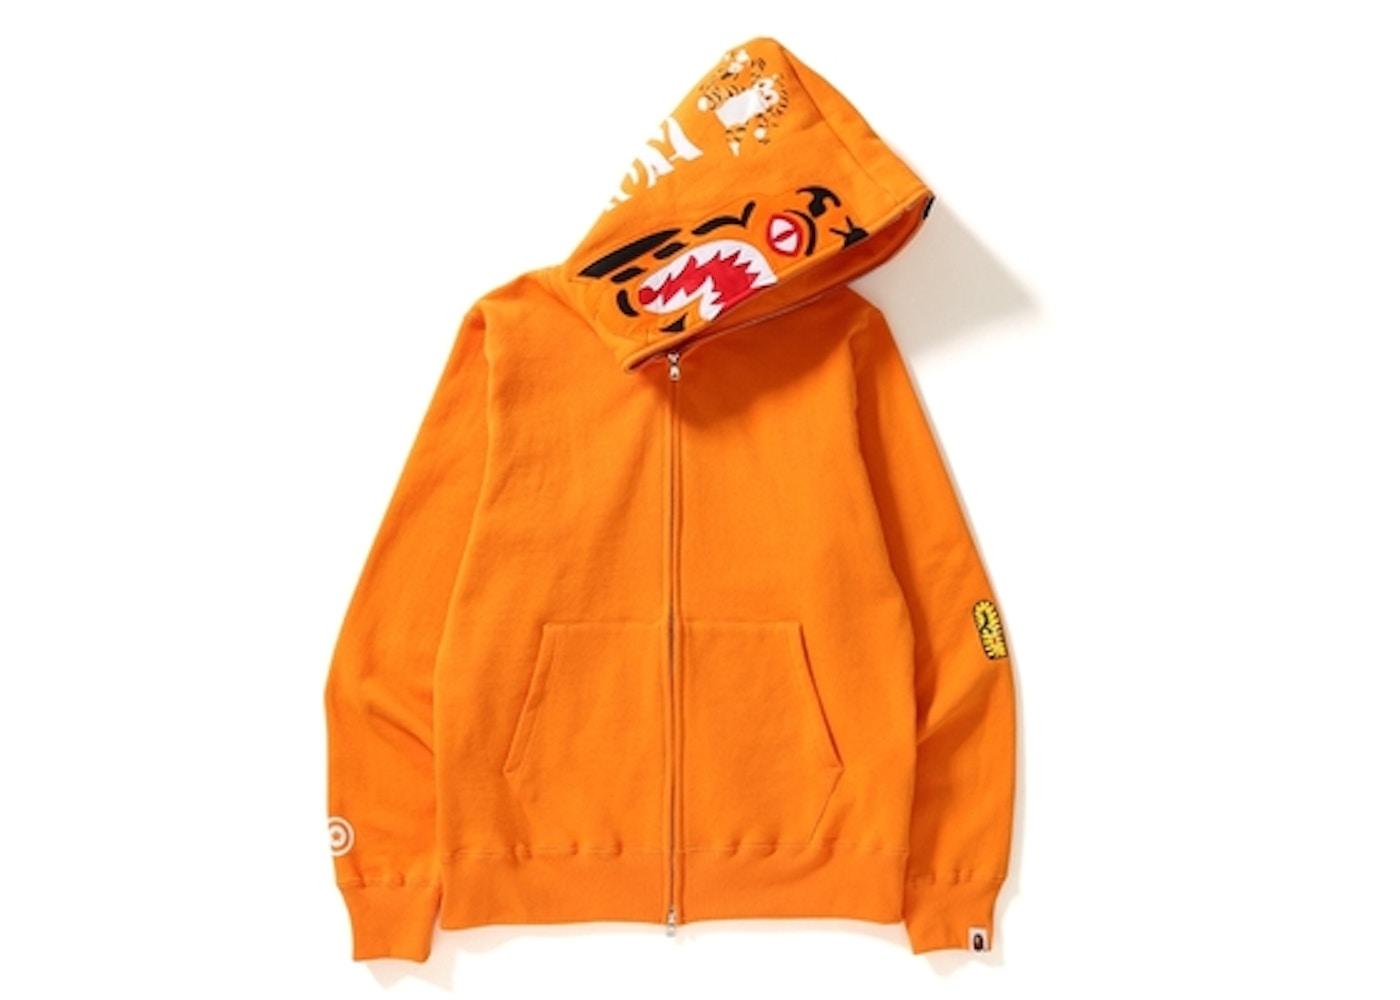 BAPE Tiger Full Zip Hoodie Orange. Tiger Full Zip 582a07d3762b